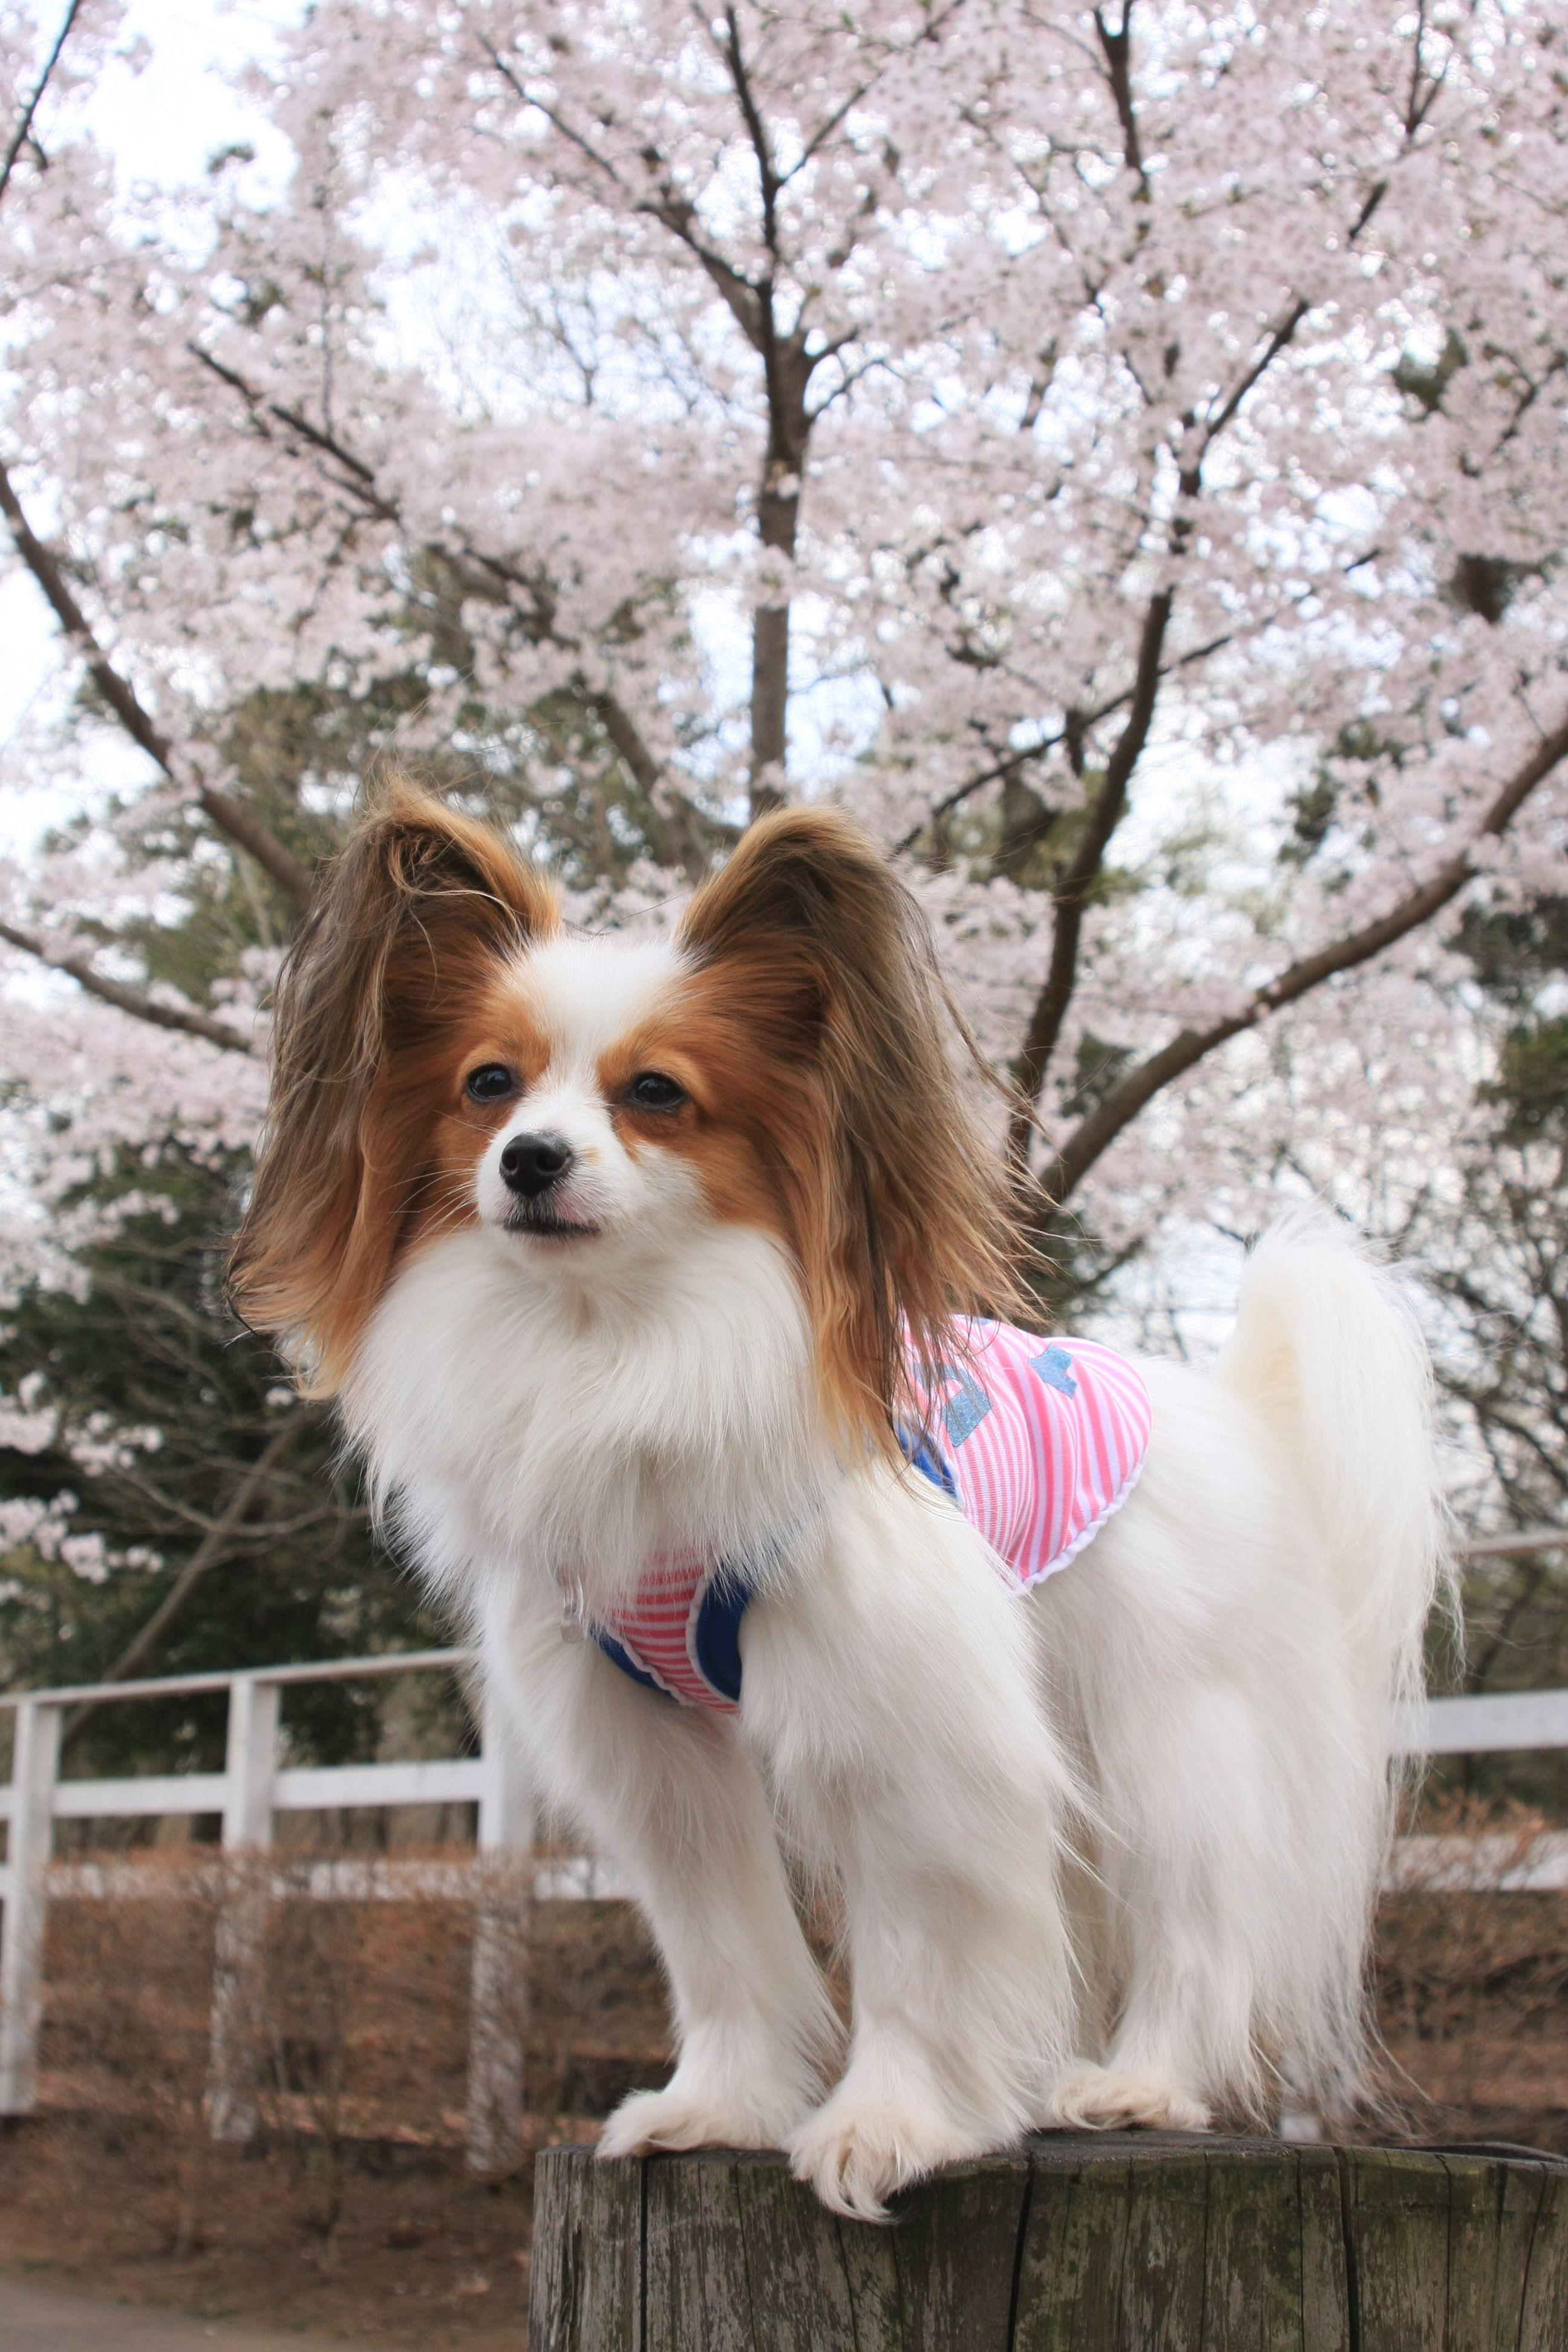 Papillon dog art portraits, photographs, information and